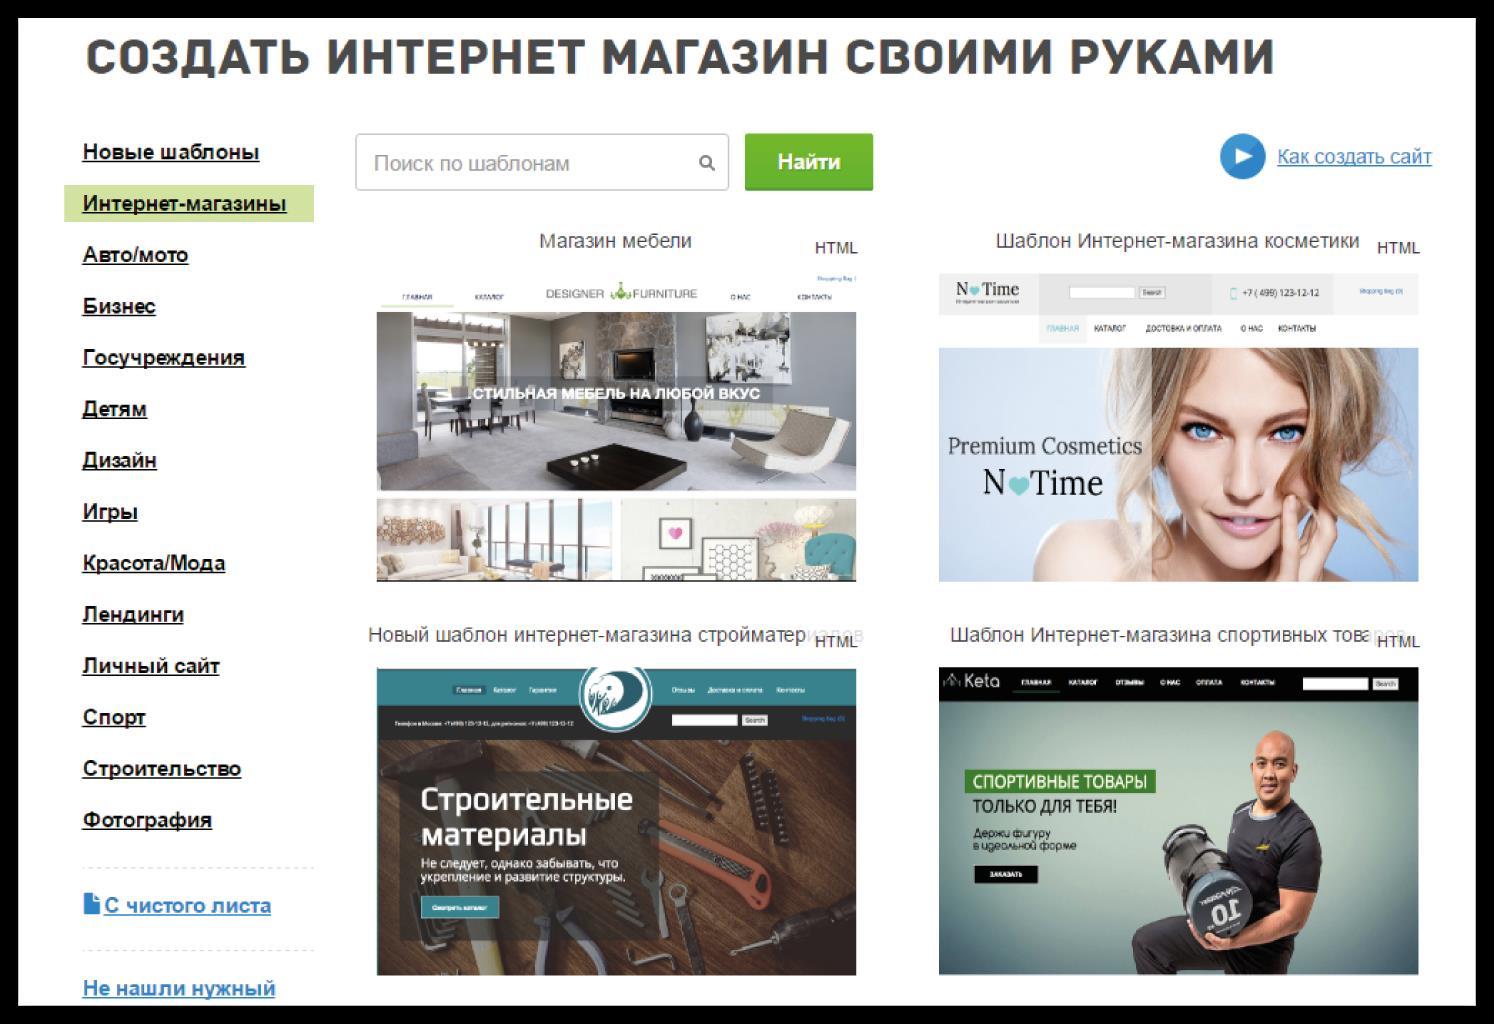 http://adw-kupon.ru/a5/a5-2.jpg